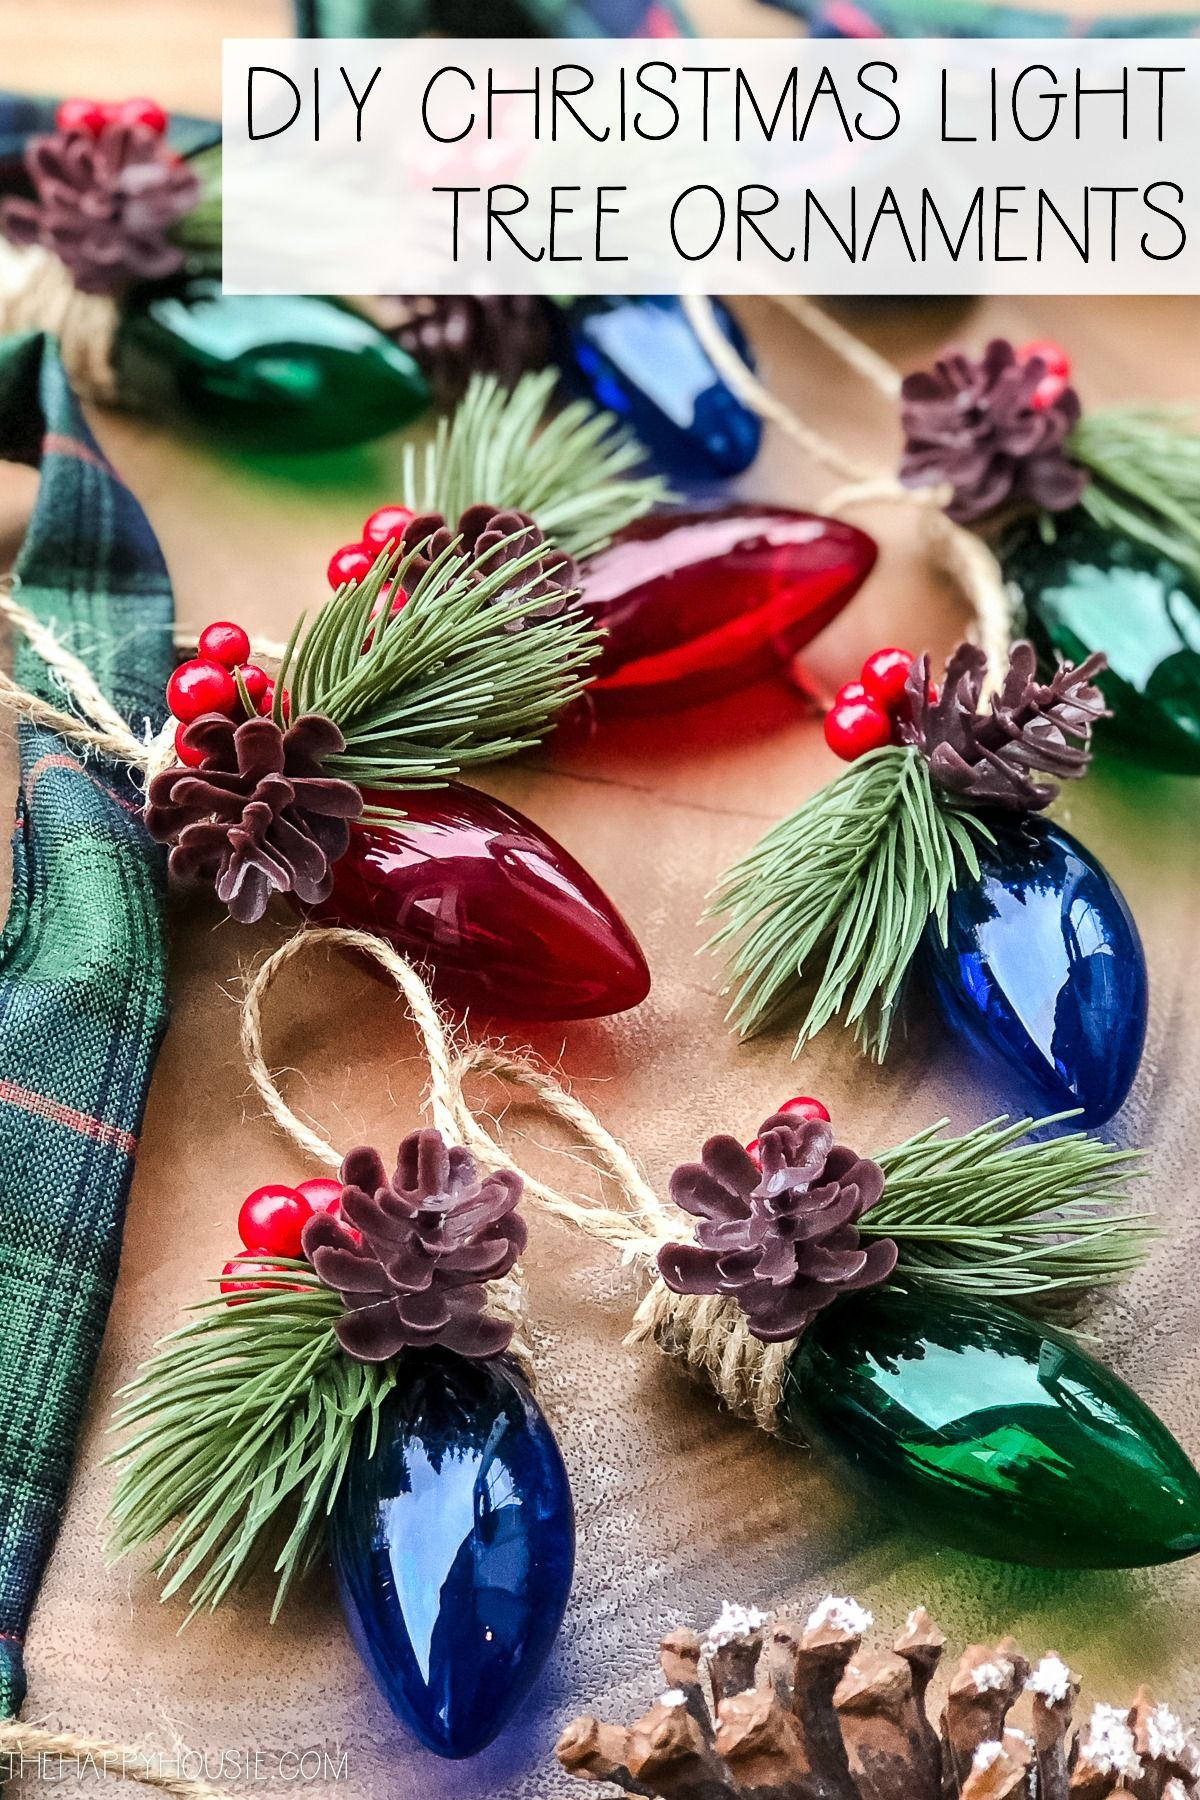 DIY Christmas Light Tree Ornament | The Happy Housie